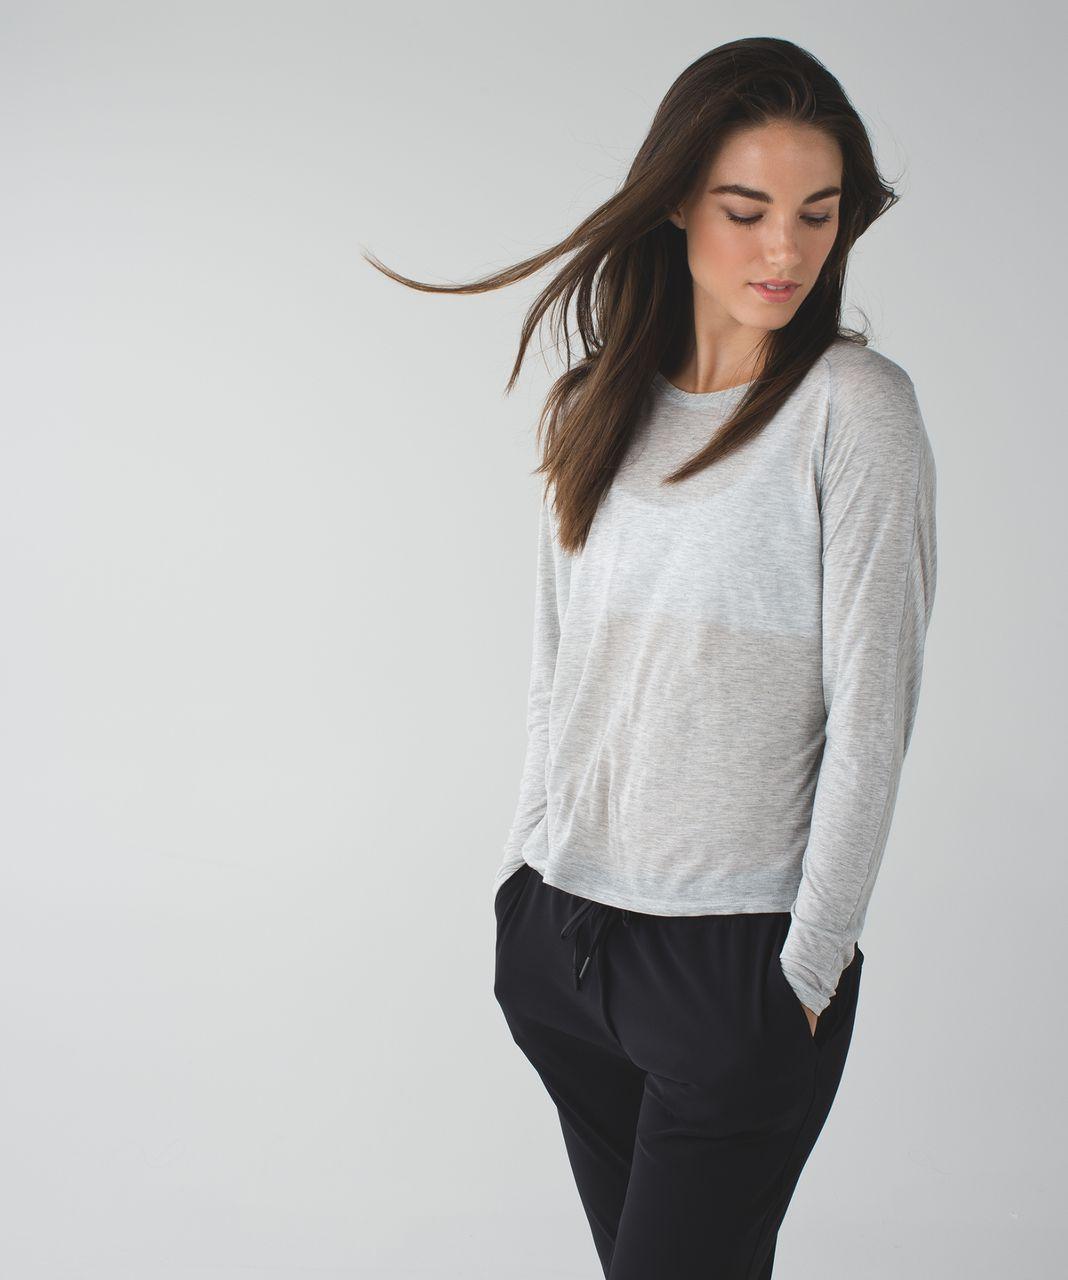 Lululemon Made To Layer Long Sleeve Tee - Heathered Mod Light Grey